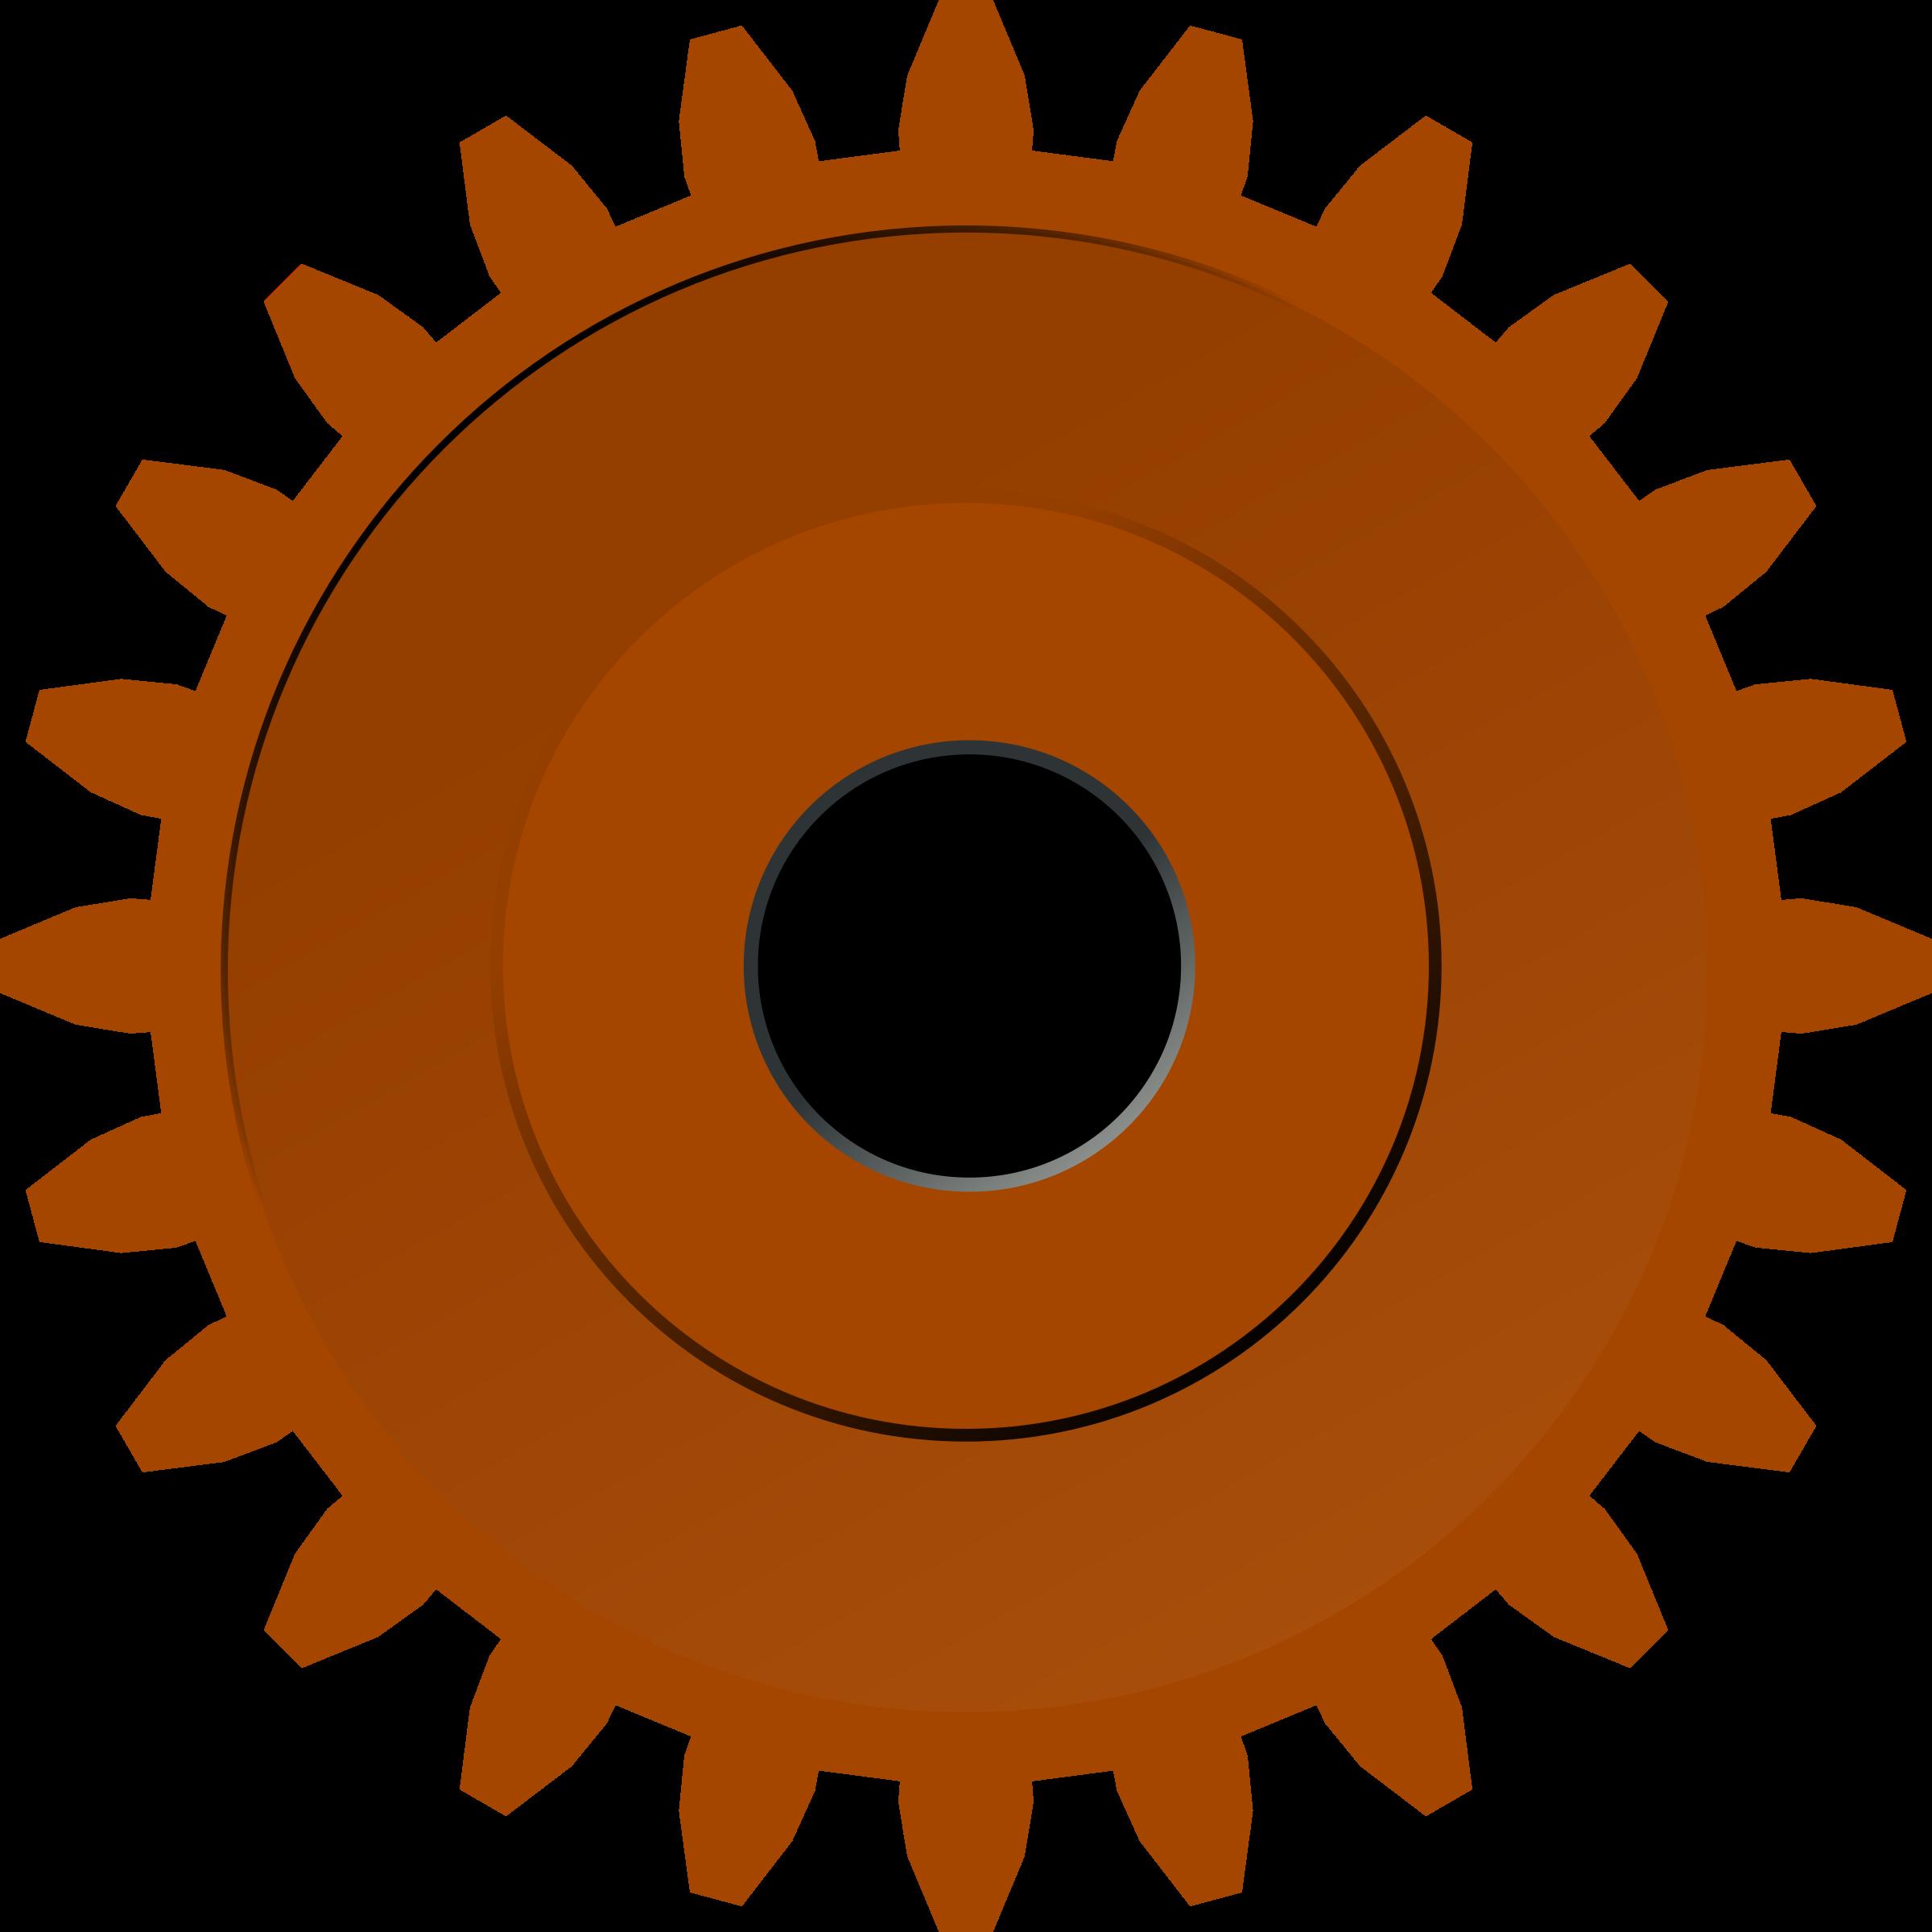 Steam gear big image. Gears clipart svg